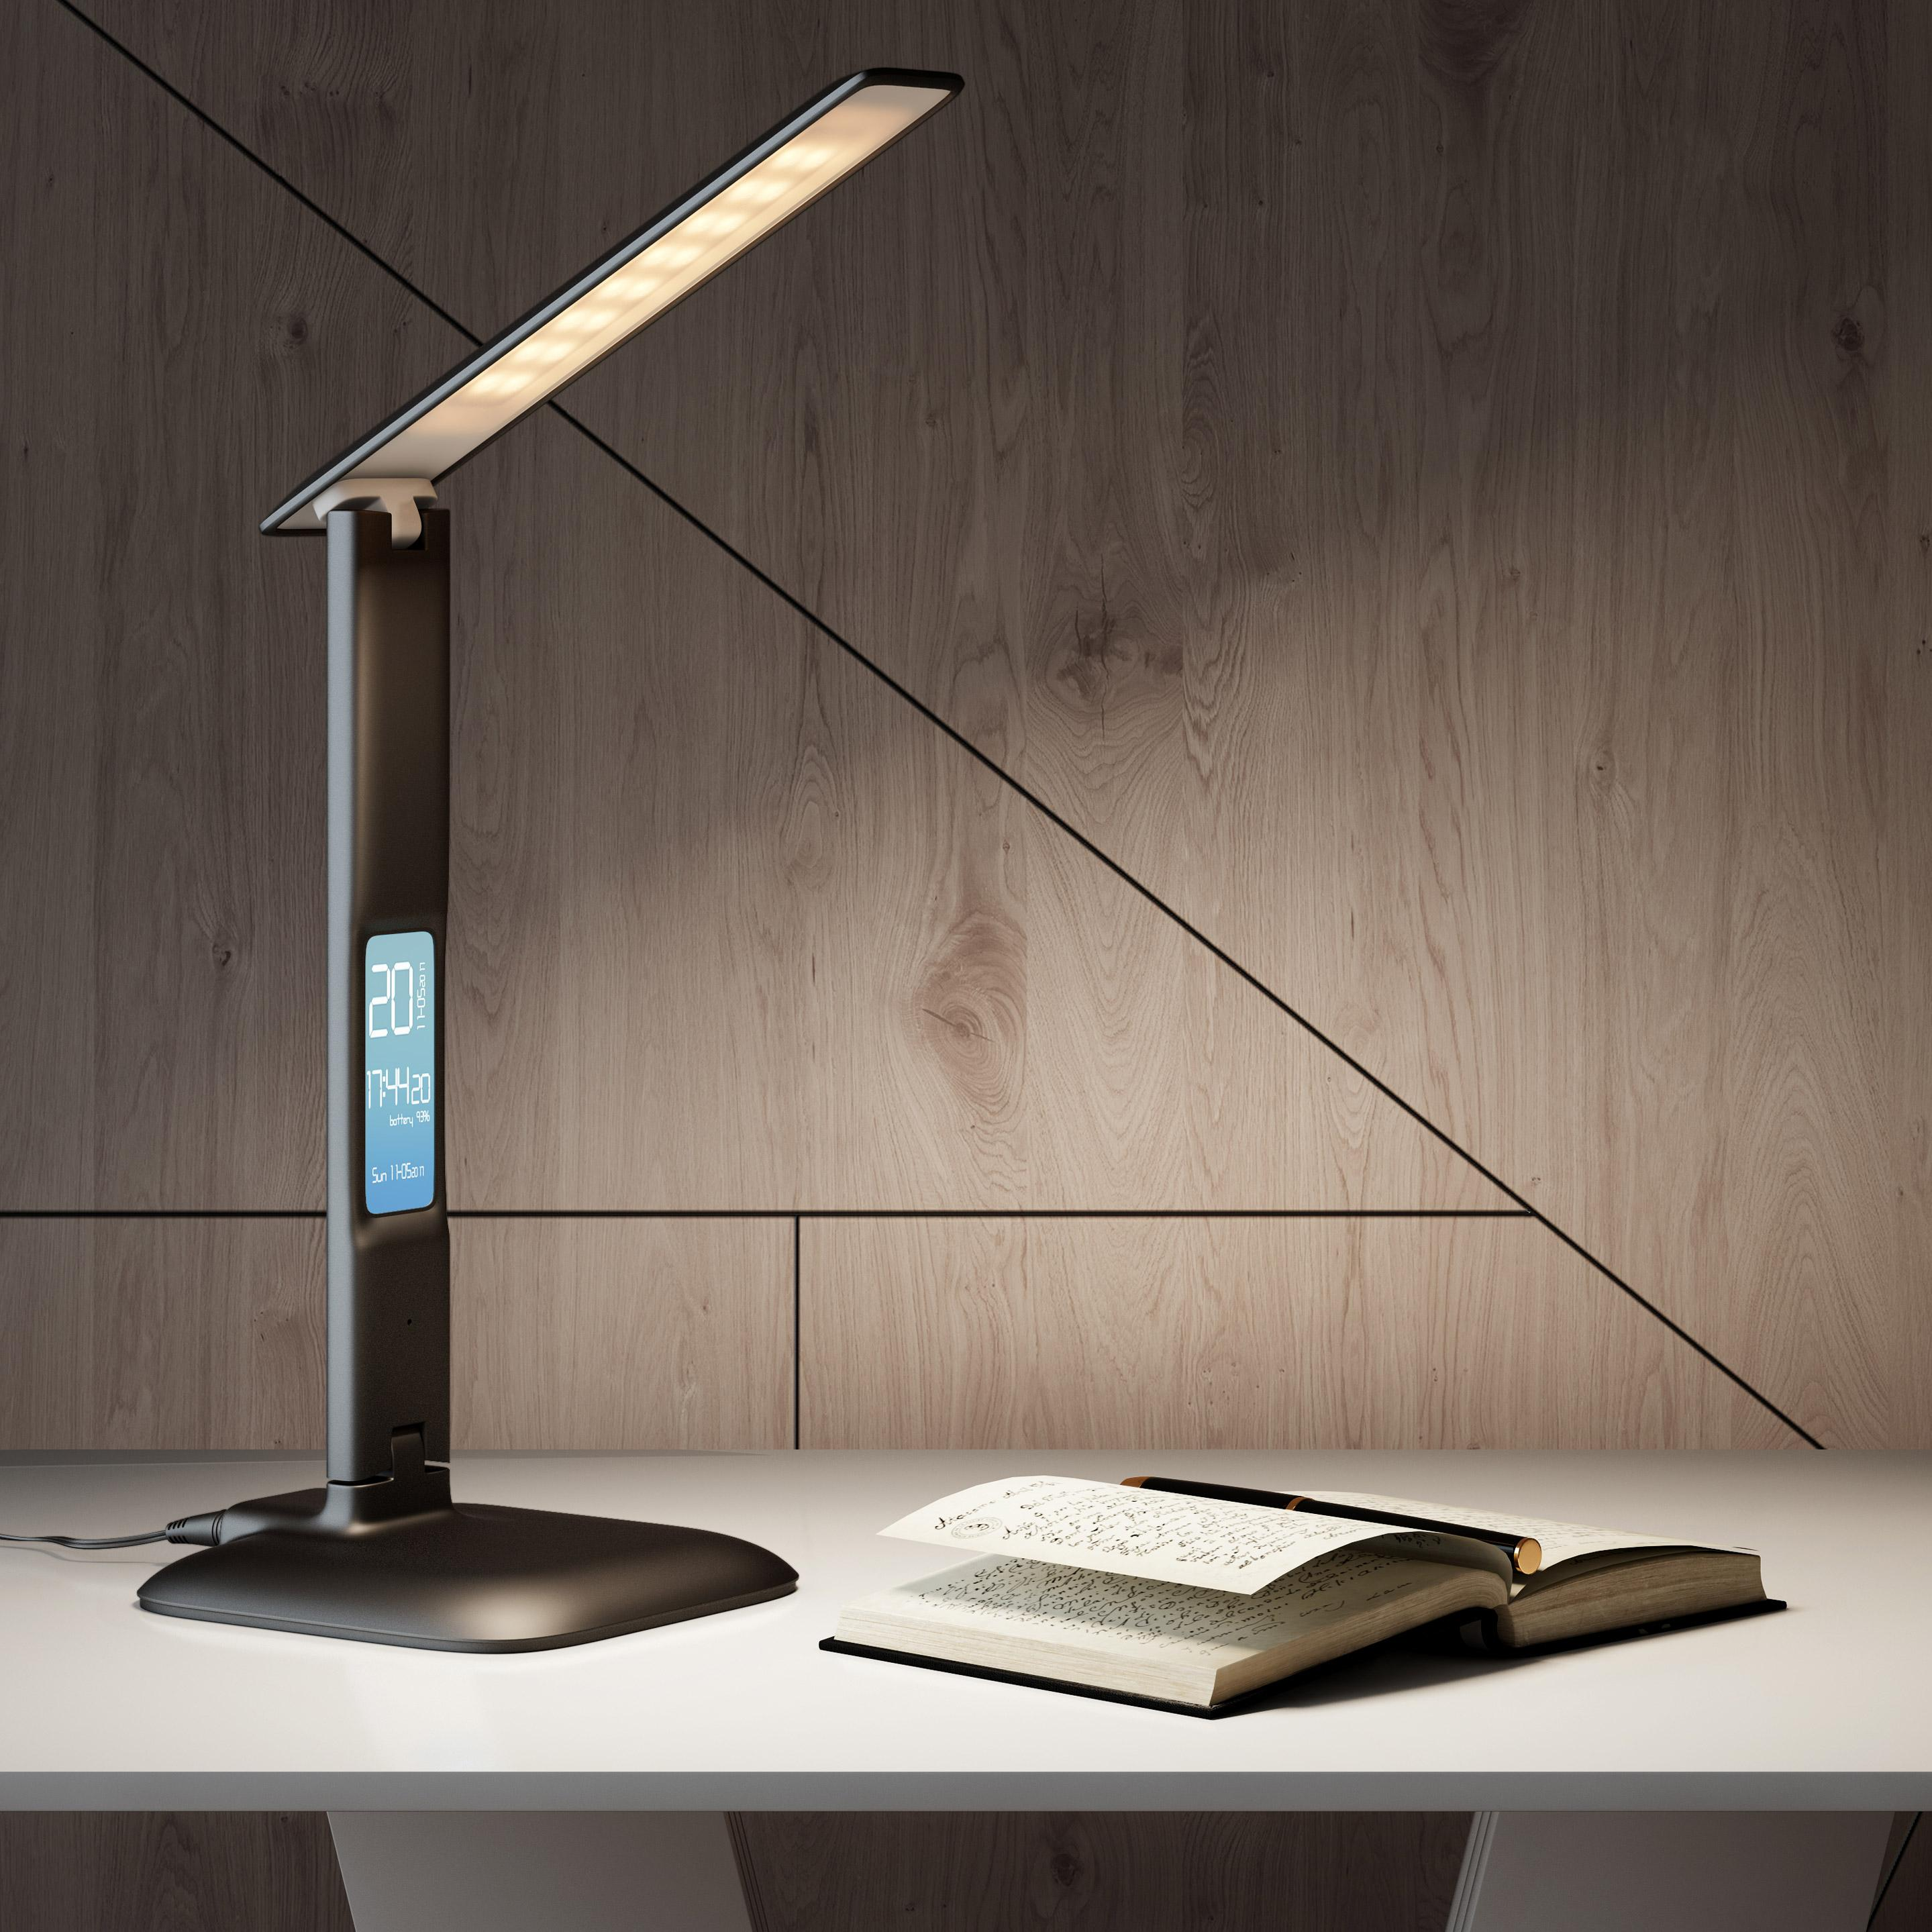 De Lampe Noir BureauModernePlastique Montre TempératureInspire Alex – TFKJlc1